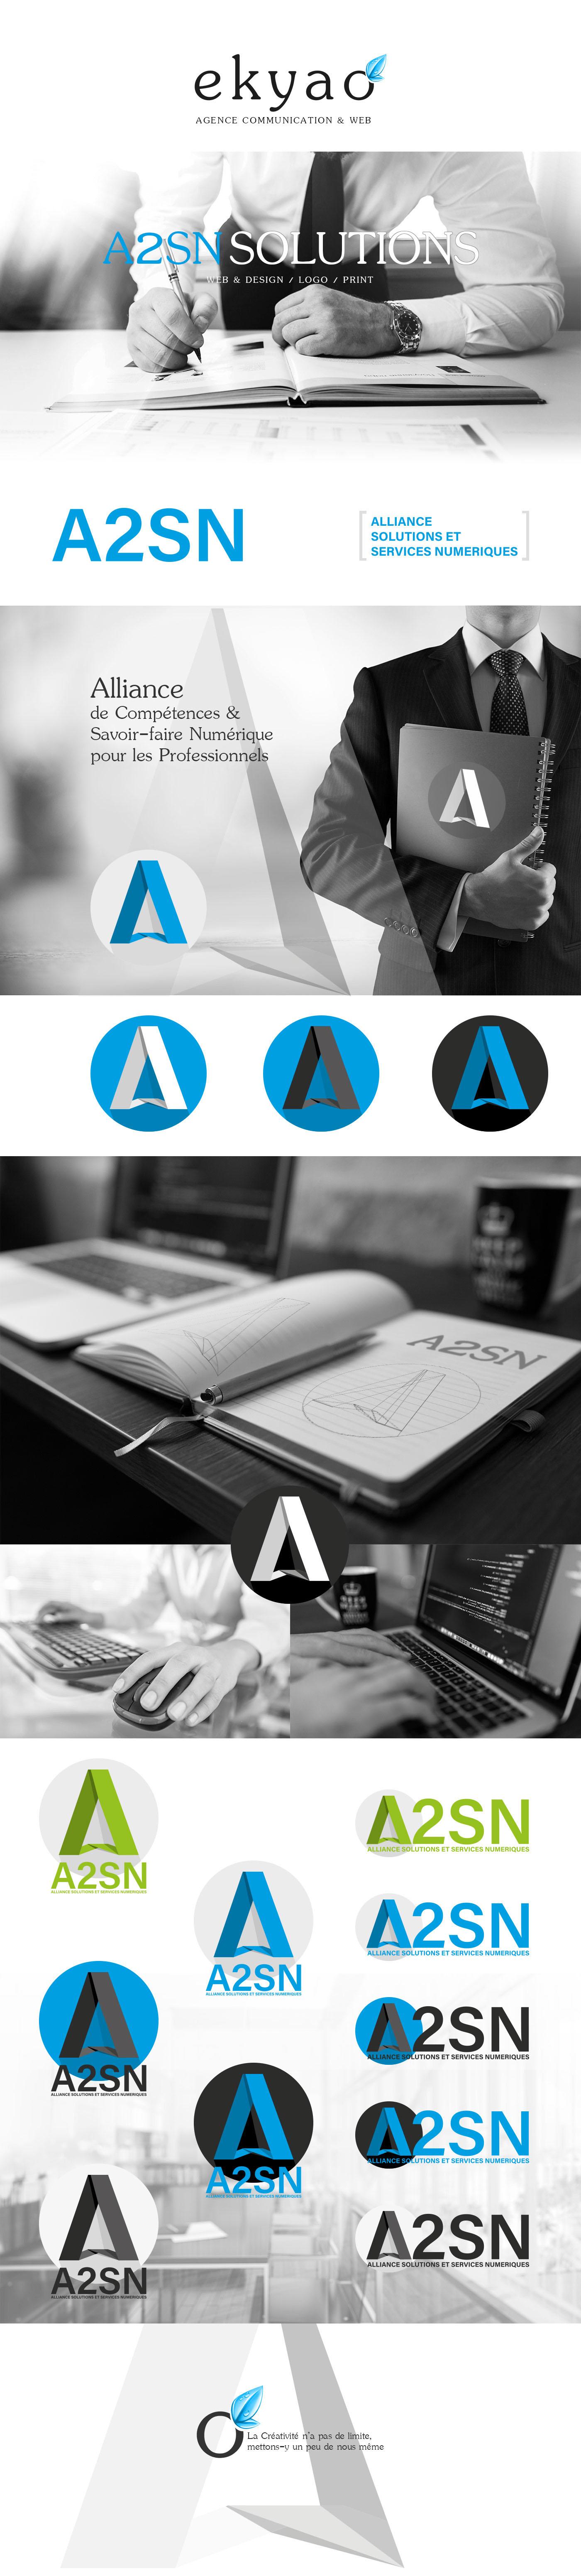 Adobe Portfolio ekyao logo portfolio Behance Webdesign design Responsive agence communication Web presentation a2sn